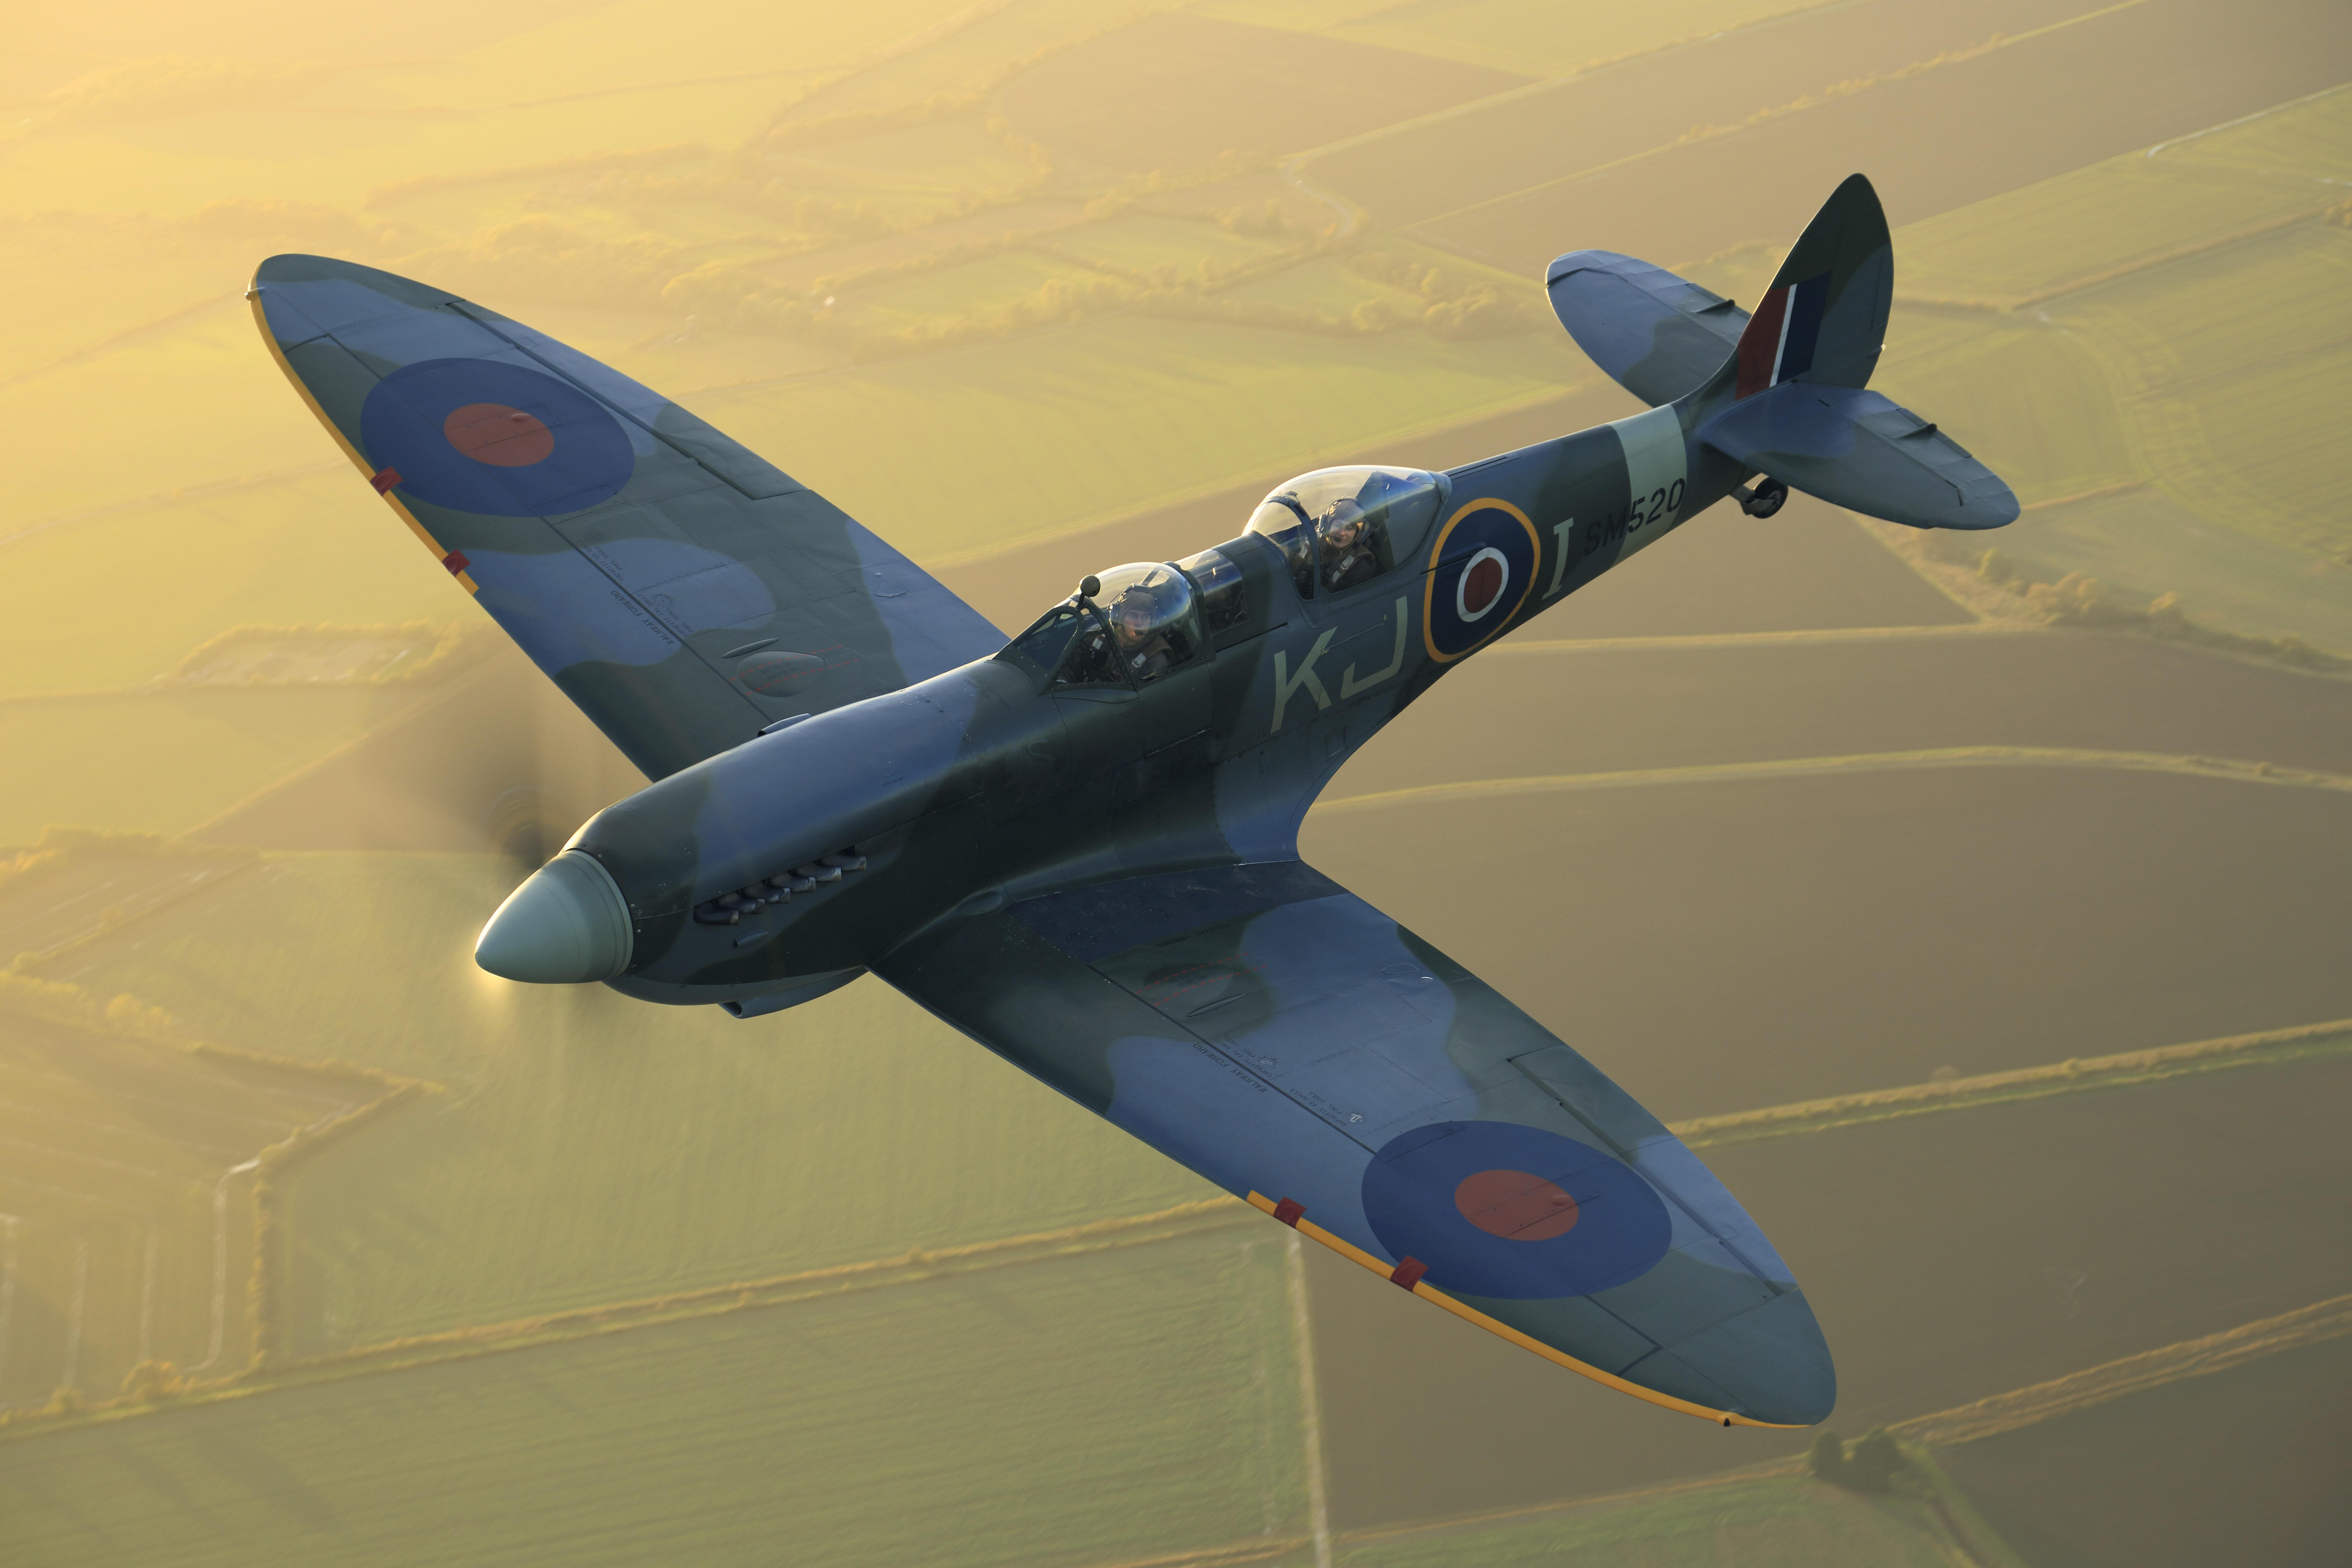 SM520 | Spitfire Flight Experiences from Goodwood Aerodrome, UK